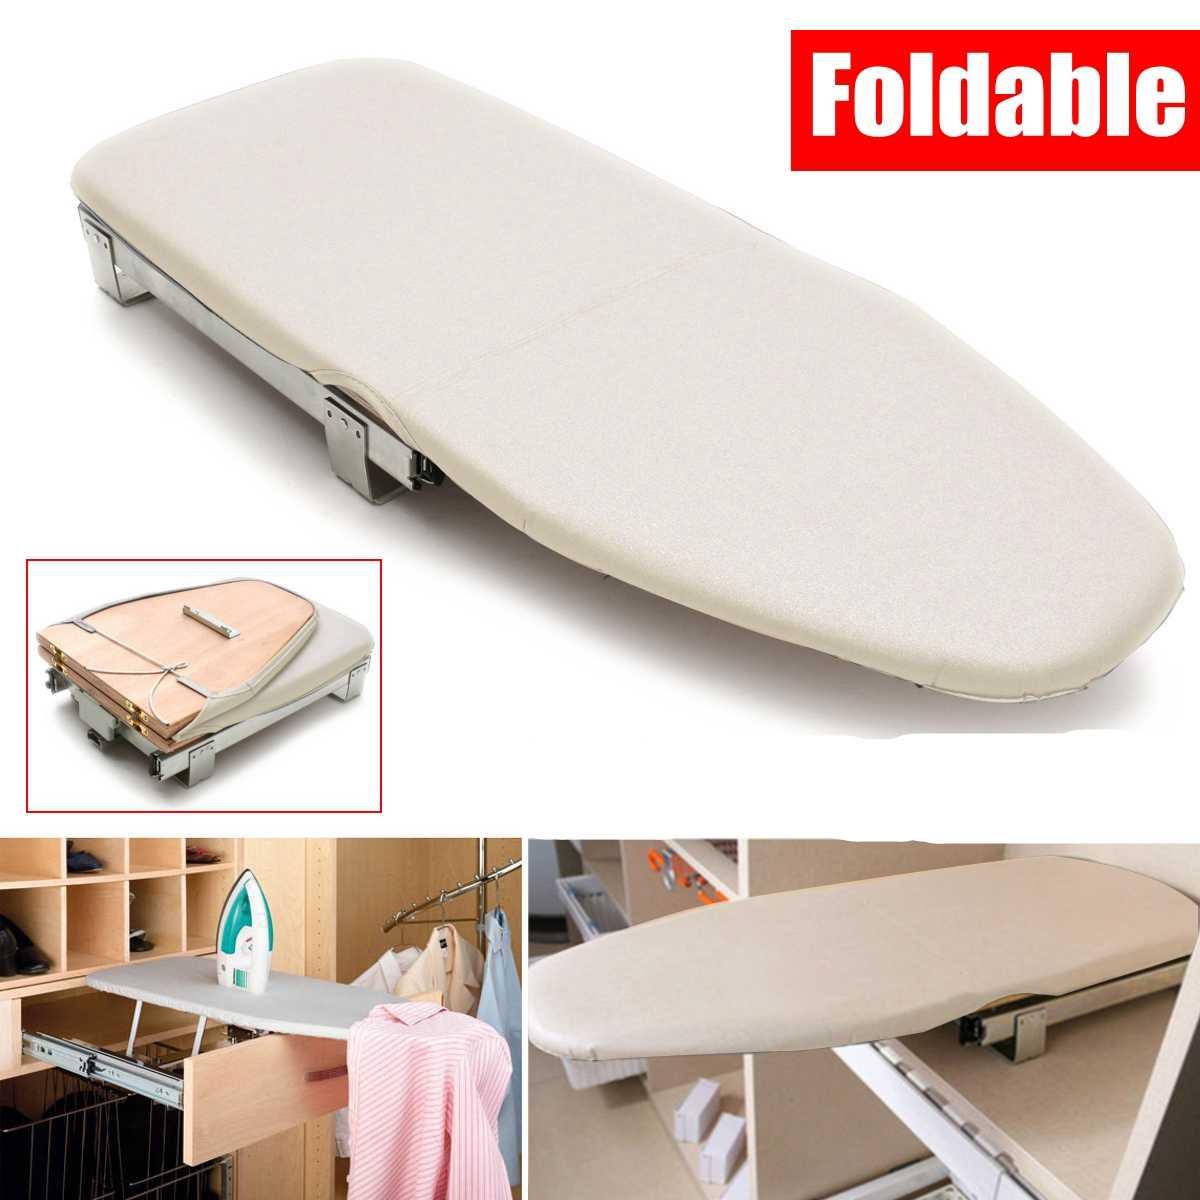 Folding Ironing Board Heat Resistant